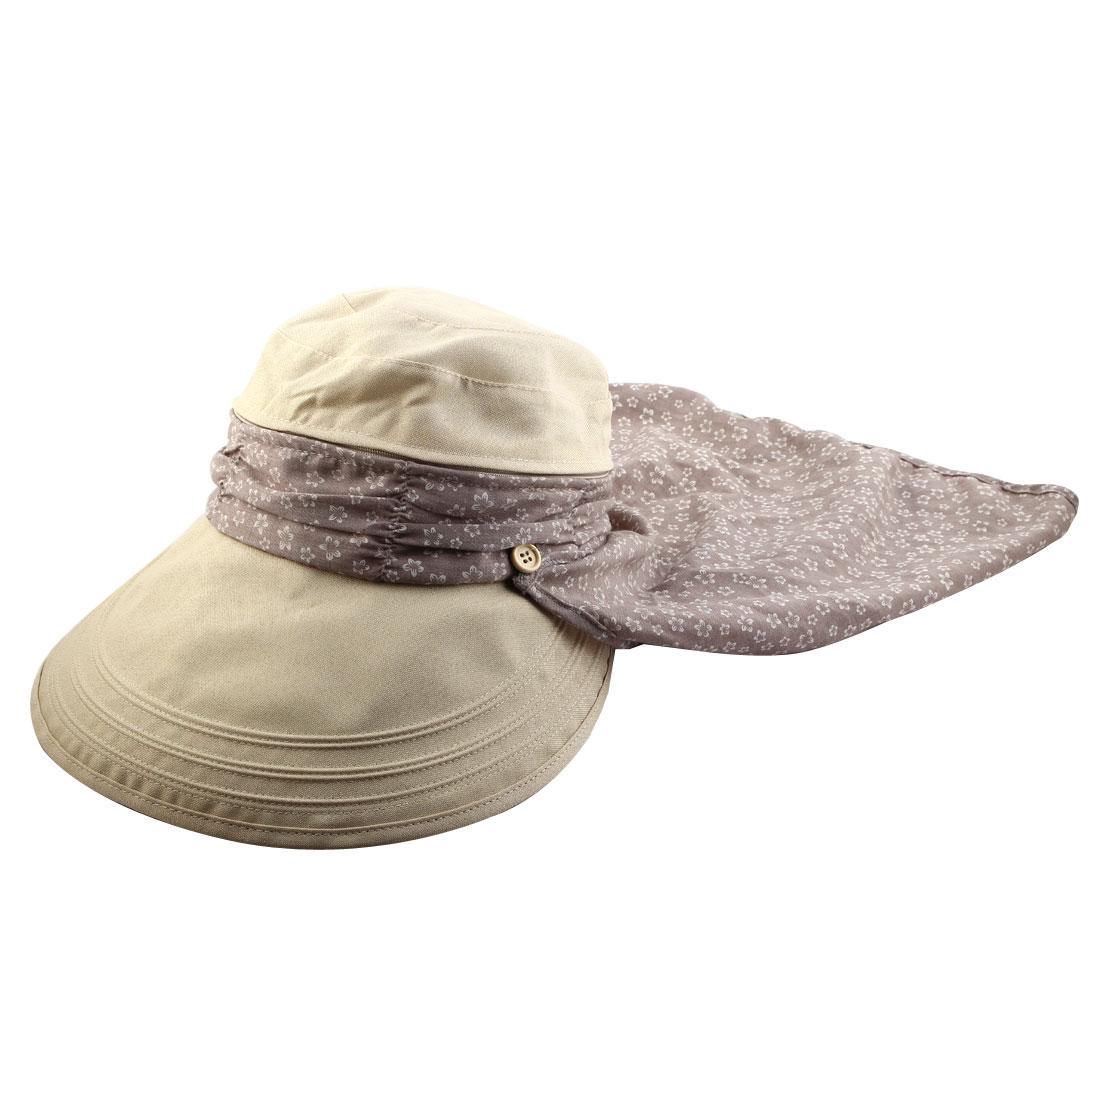 Lady Flower Printed Neck Protection Wide Brim Summer Floppy Cap Sun Visor Hat Beige